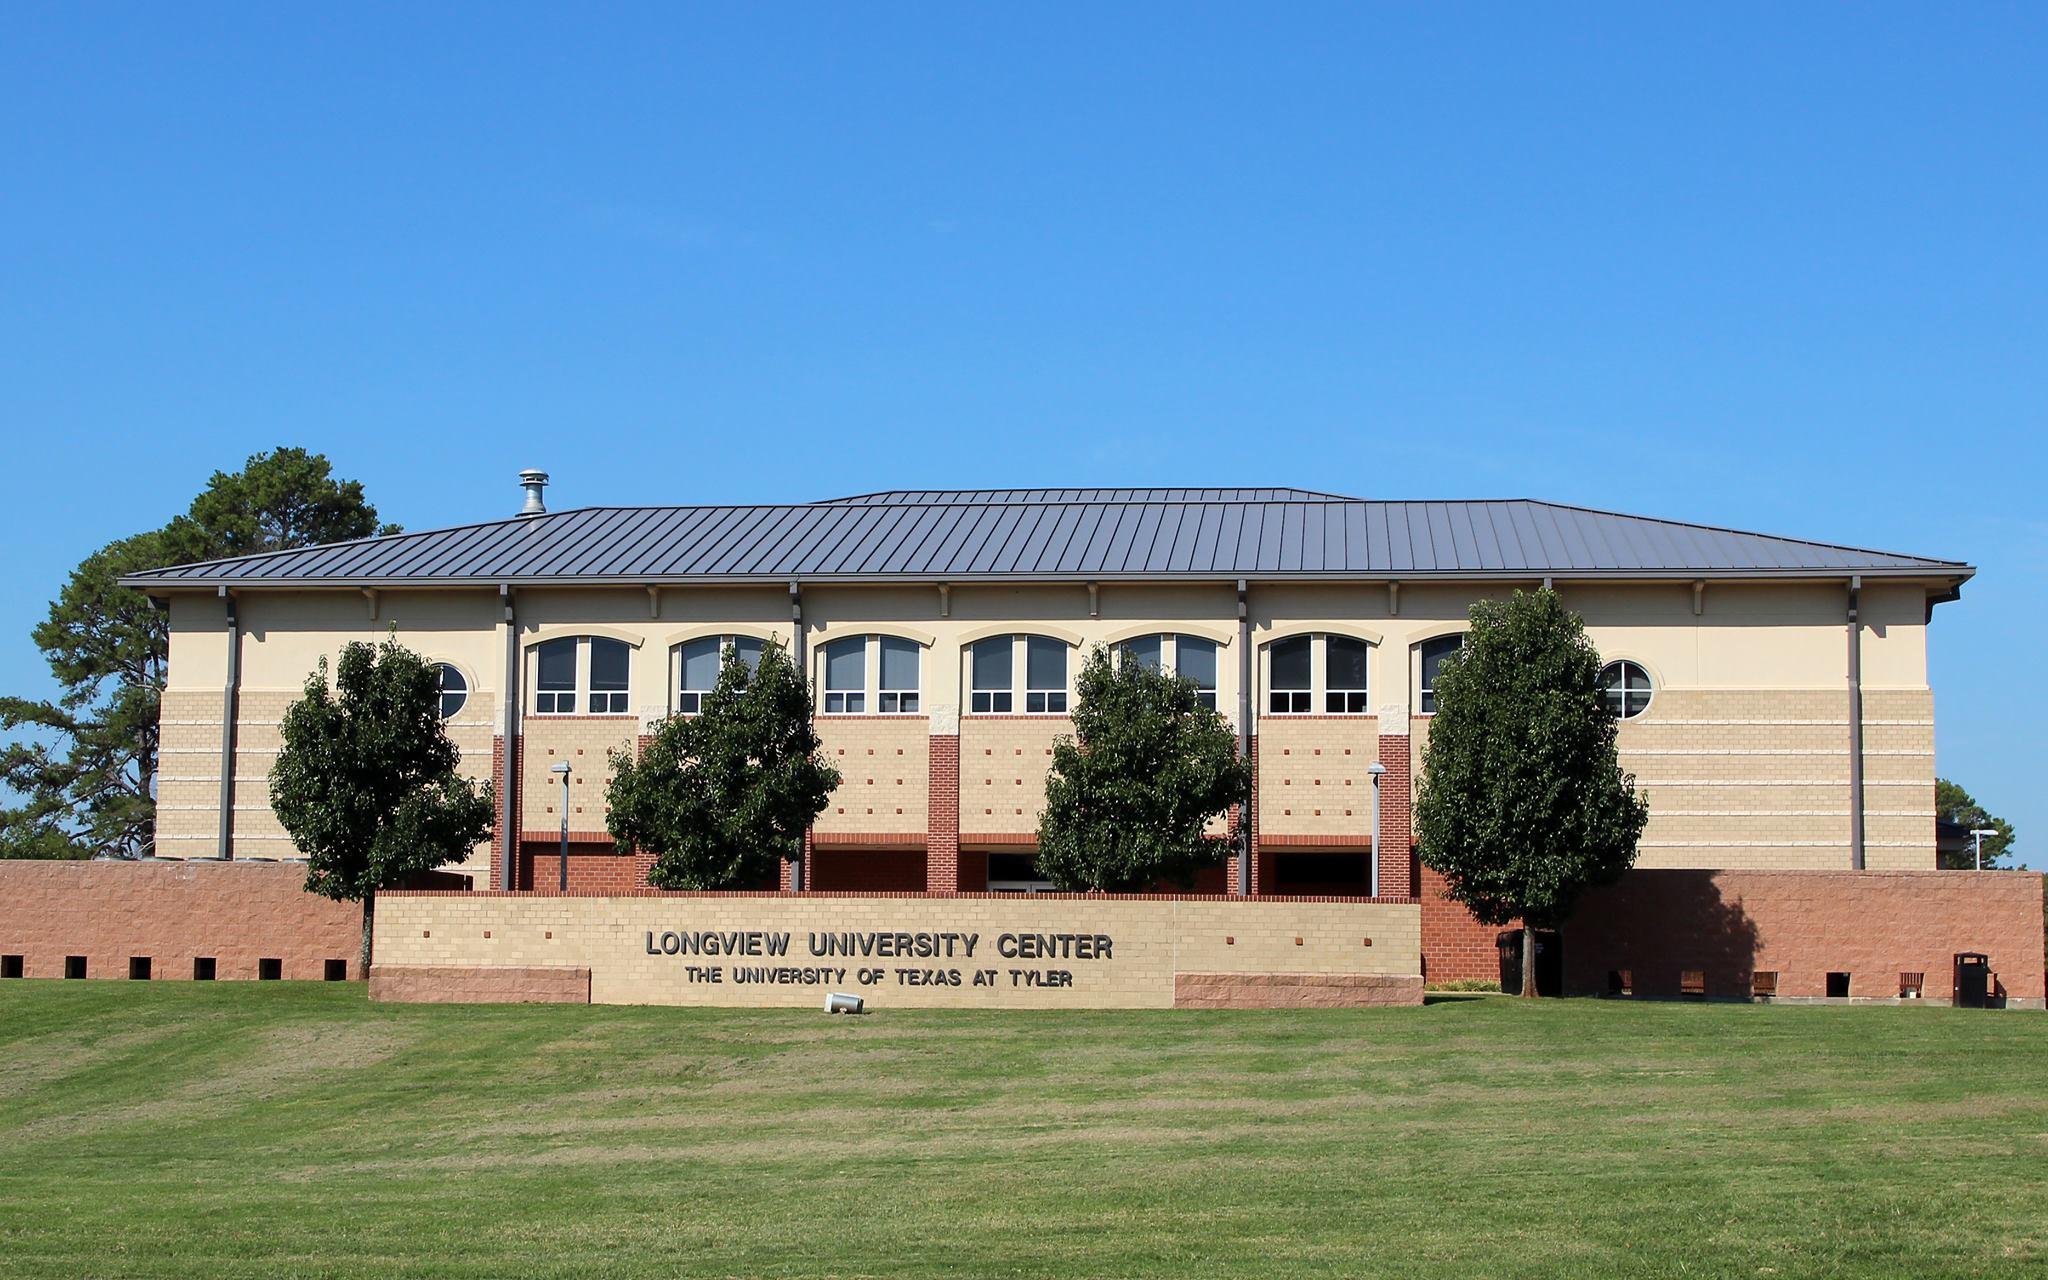 The University of Texas at Tyler - Longview University Center